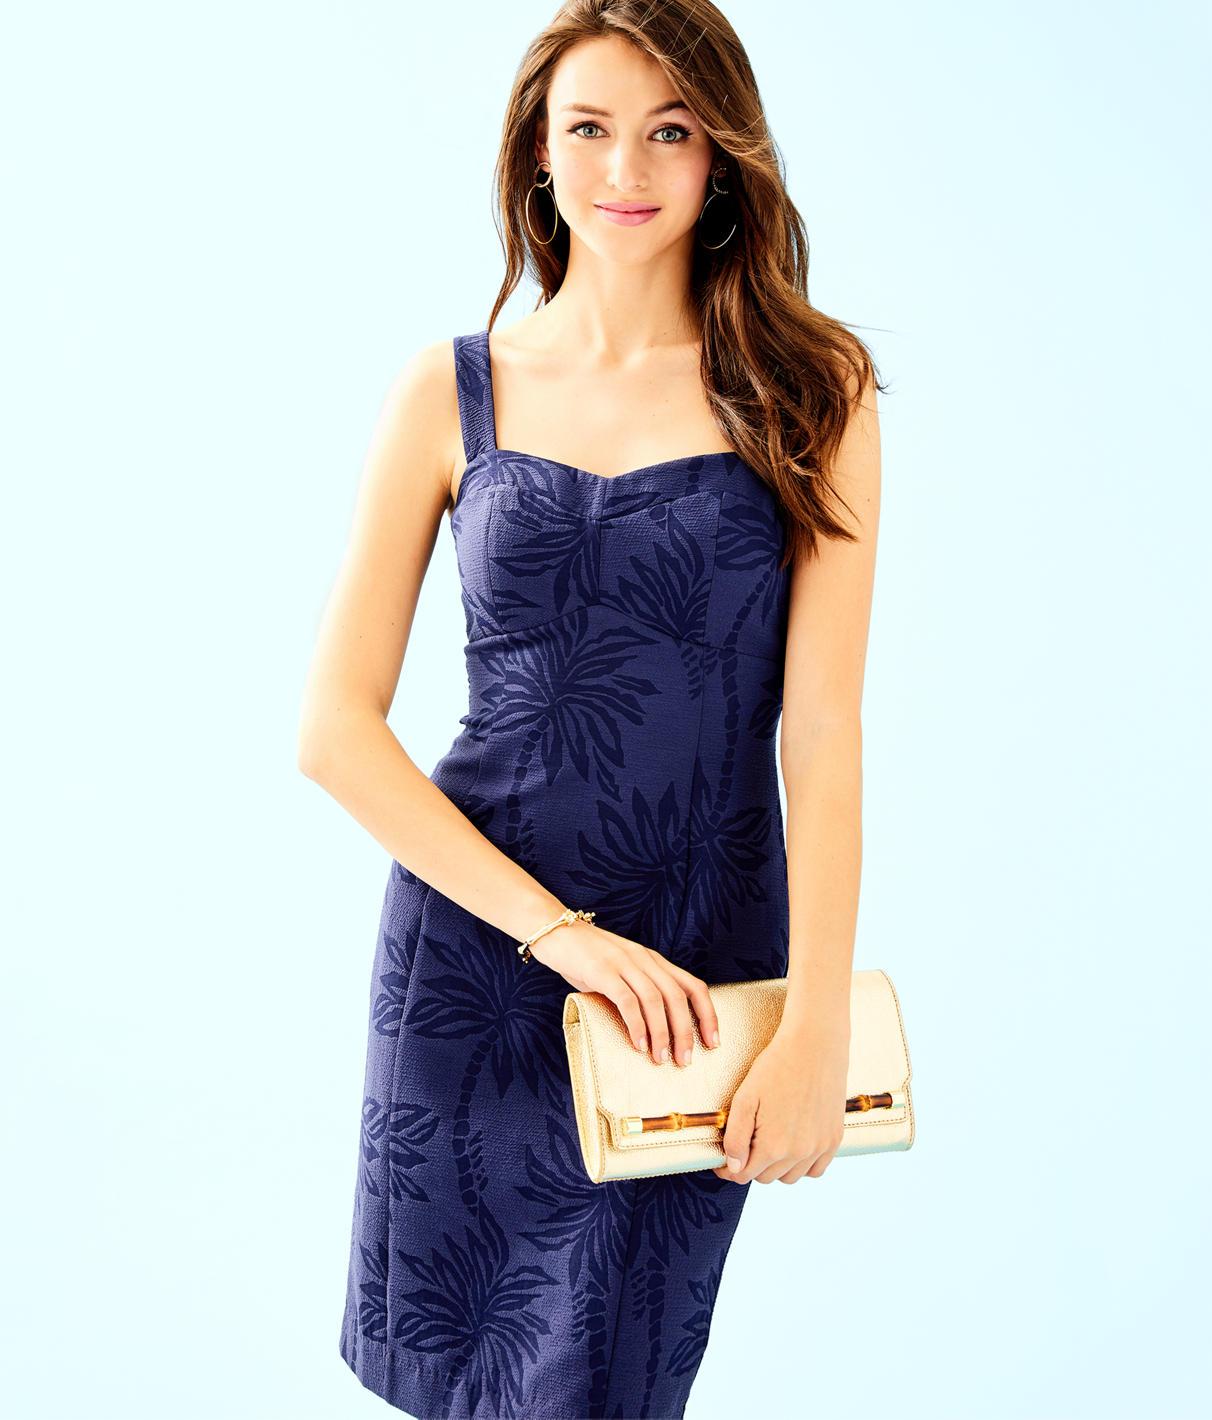 Lilly Pulitzer Annalee Stretch Dress